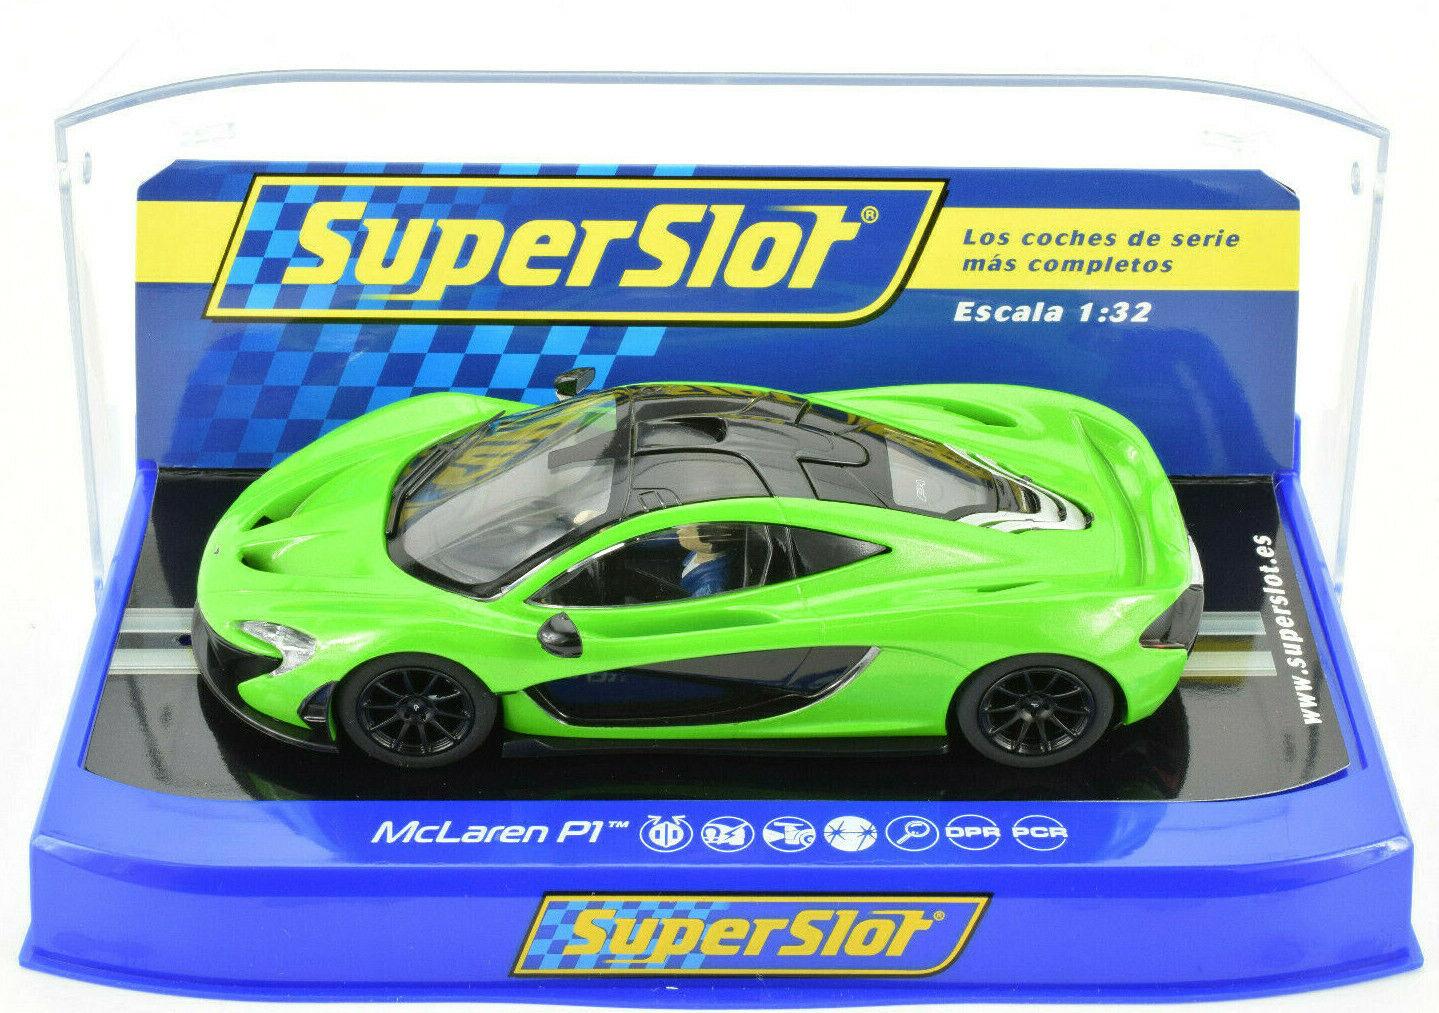 Scalextric Mantis Green McLaren P1 PCR DPR W  Lights 1 32 Scale Slot Car C3756